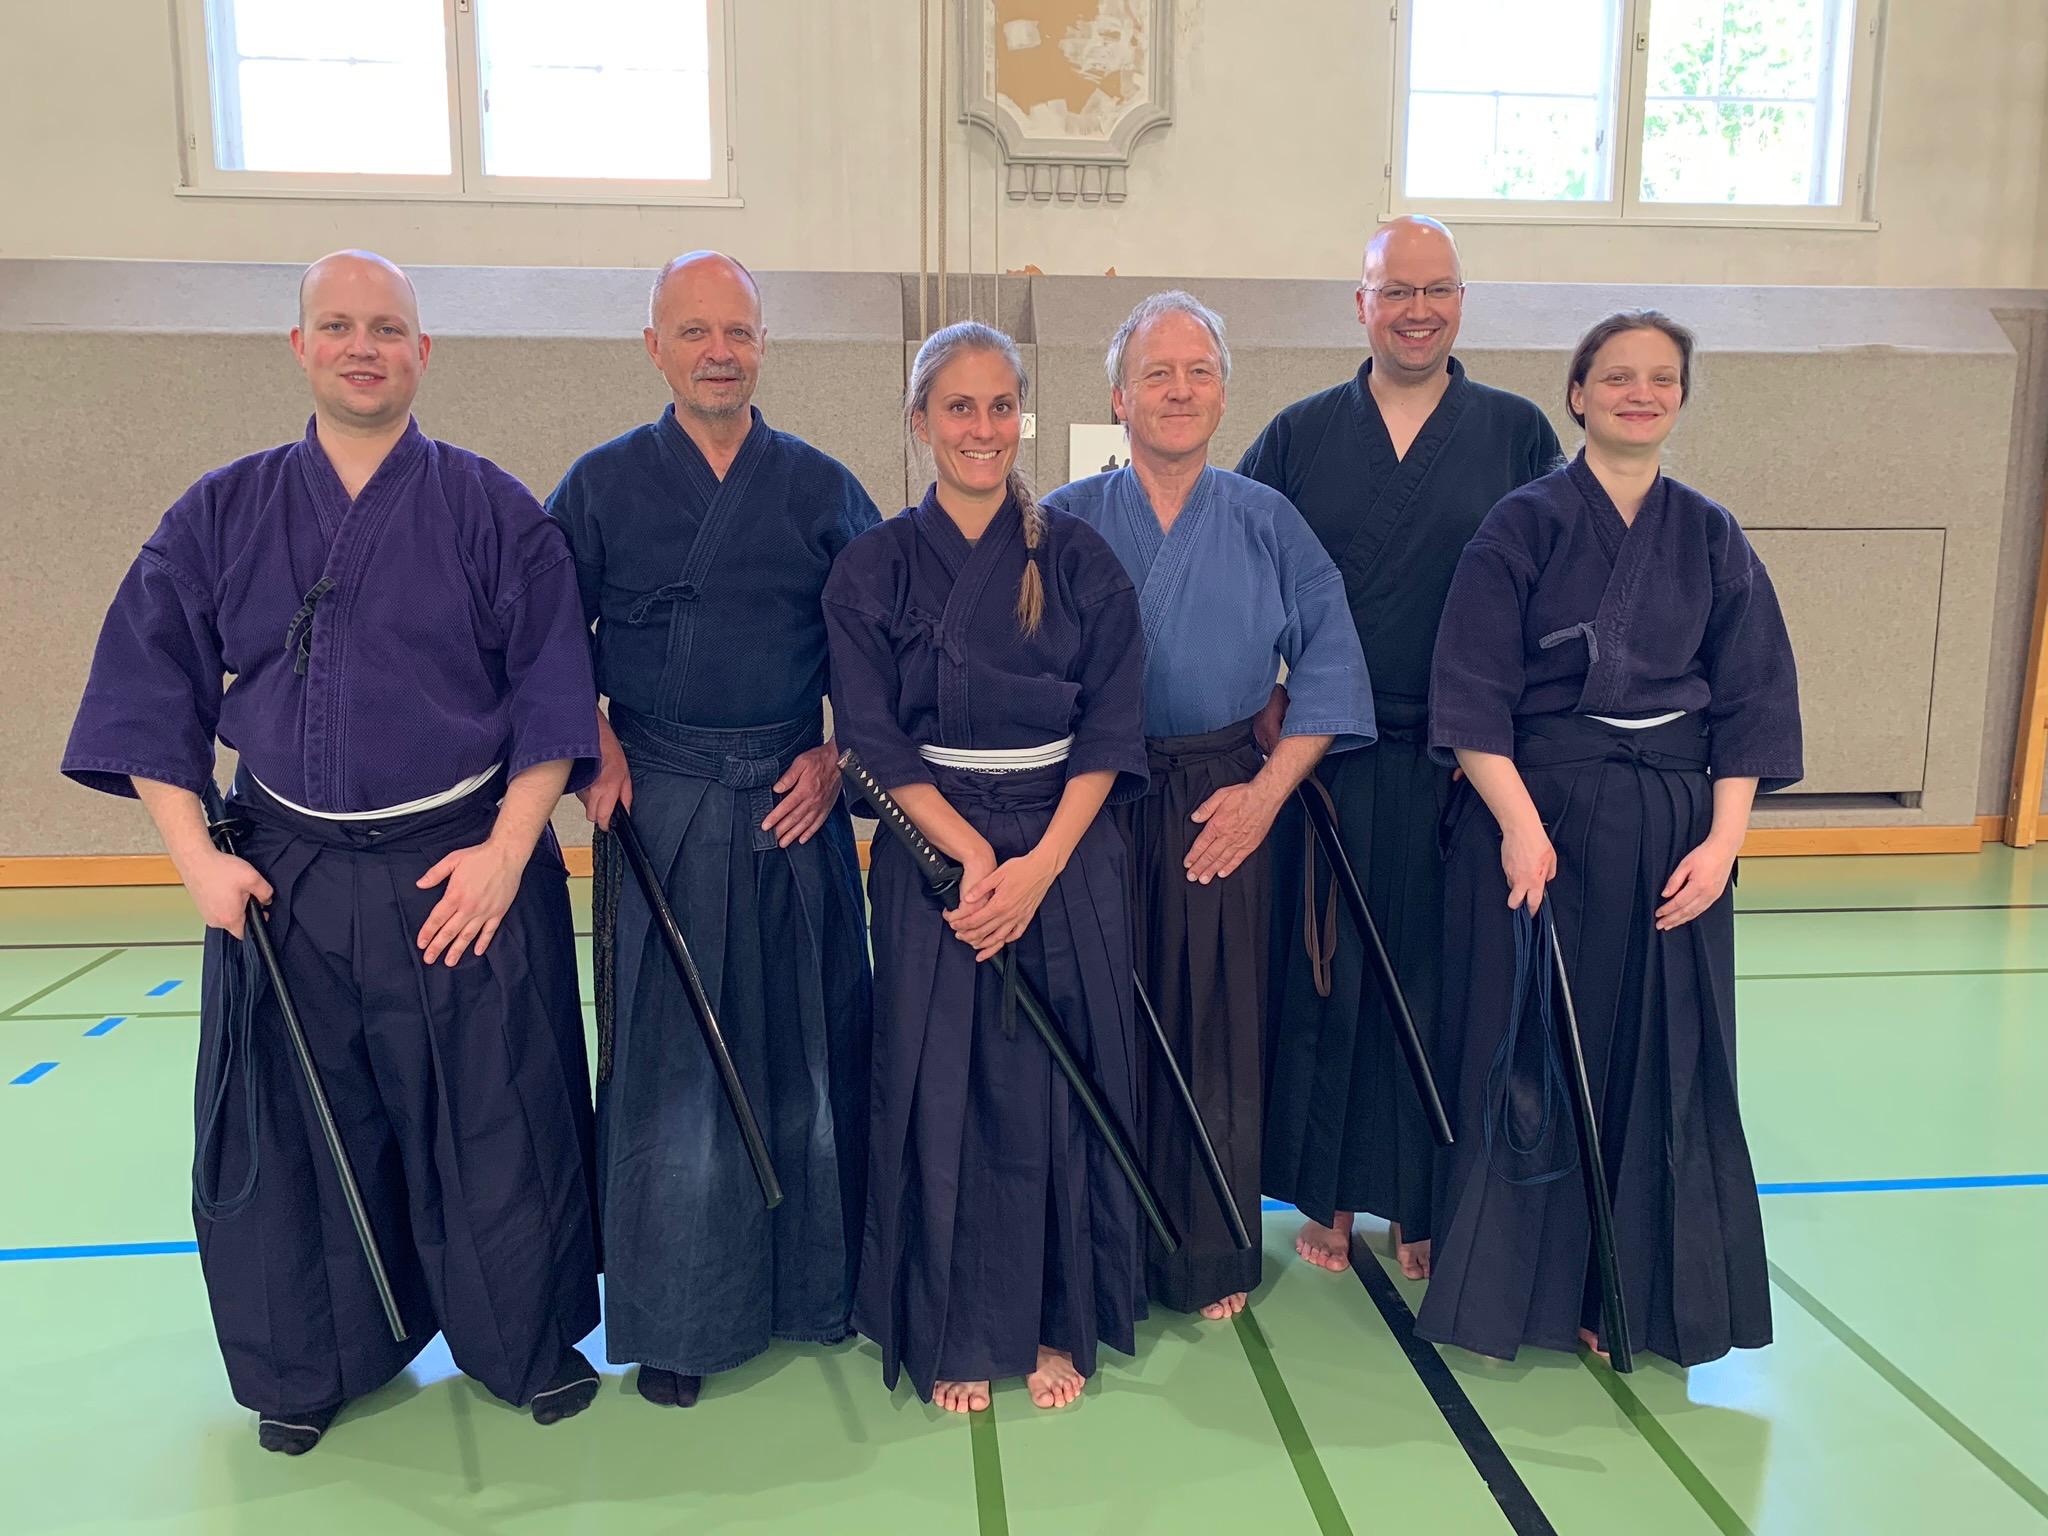 vlnr: Matthias, Werner, Ursi, Norbert, Gernot und Michaela